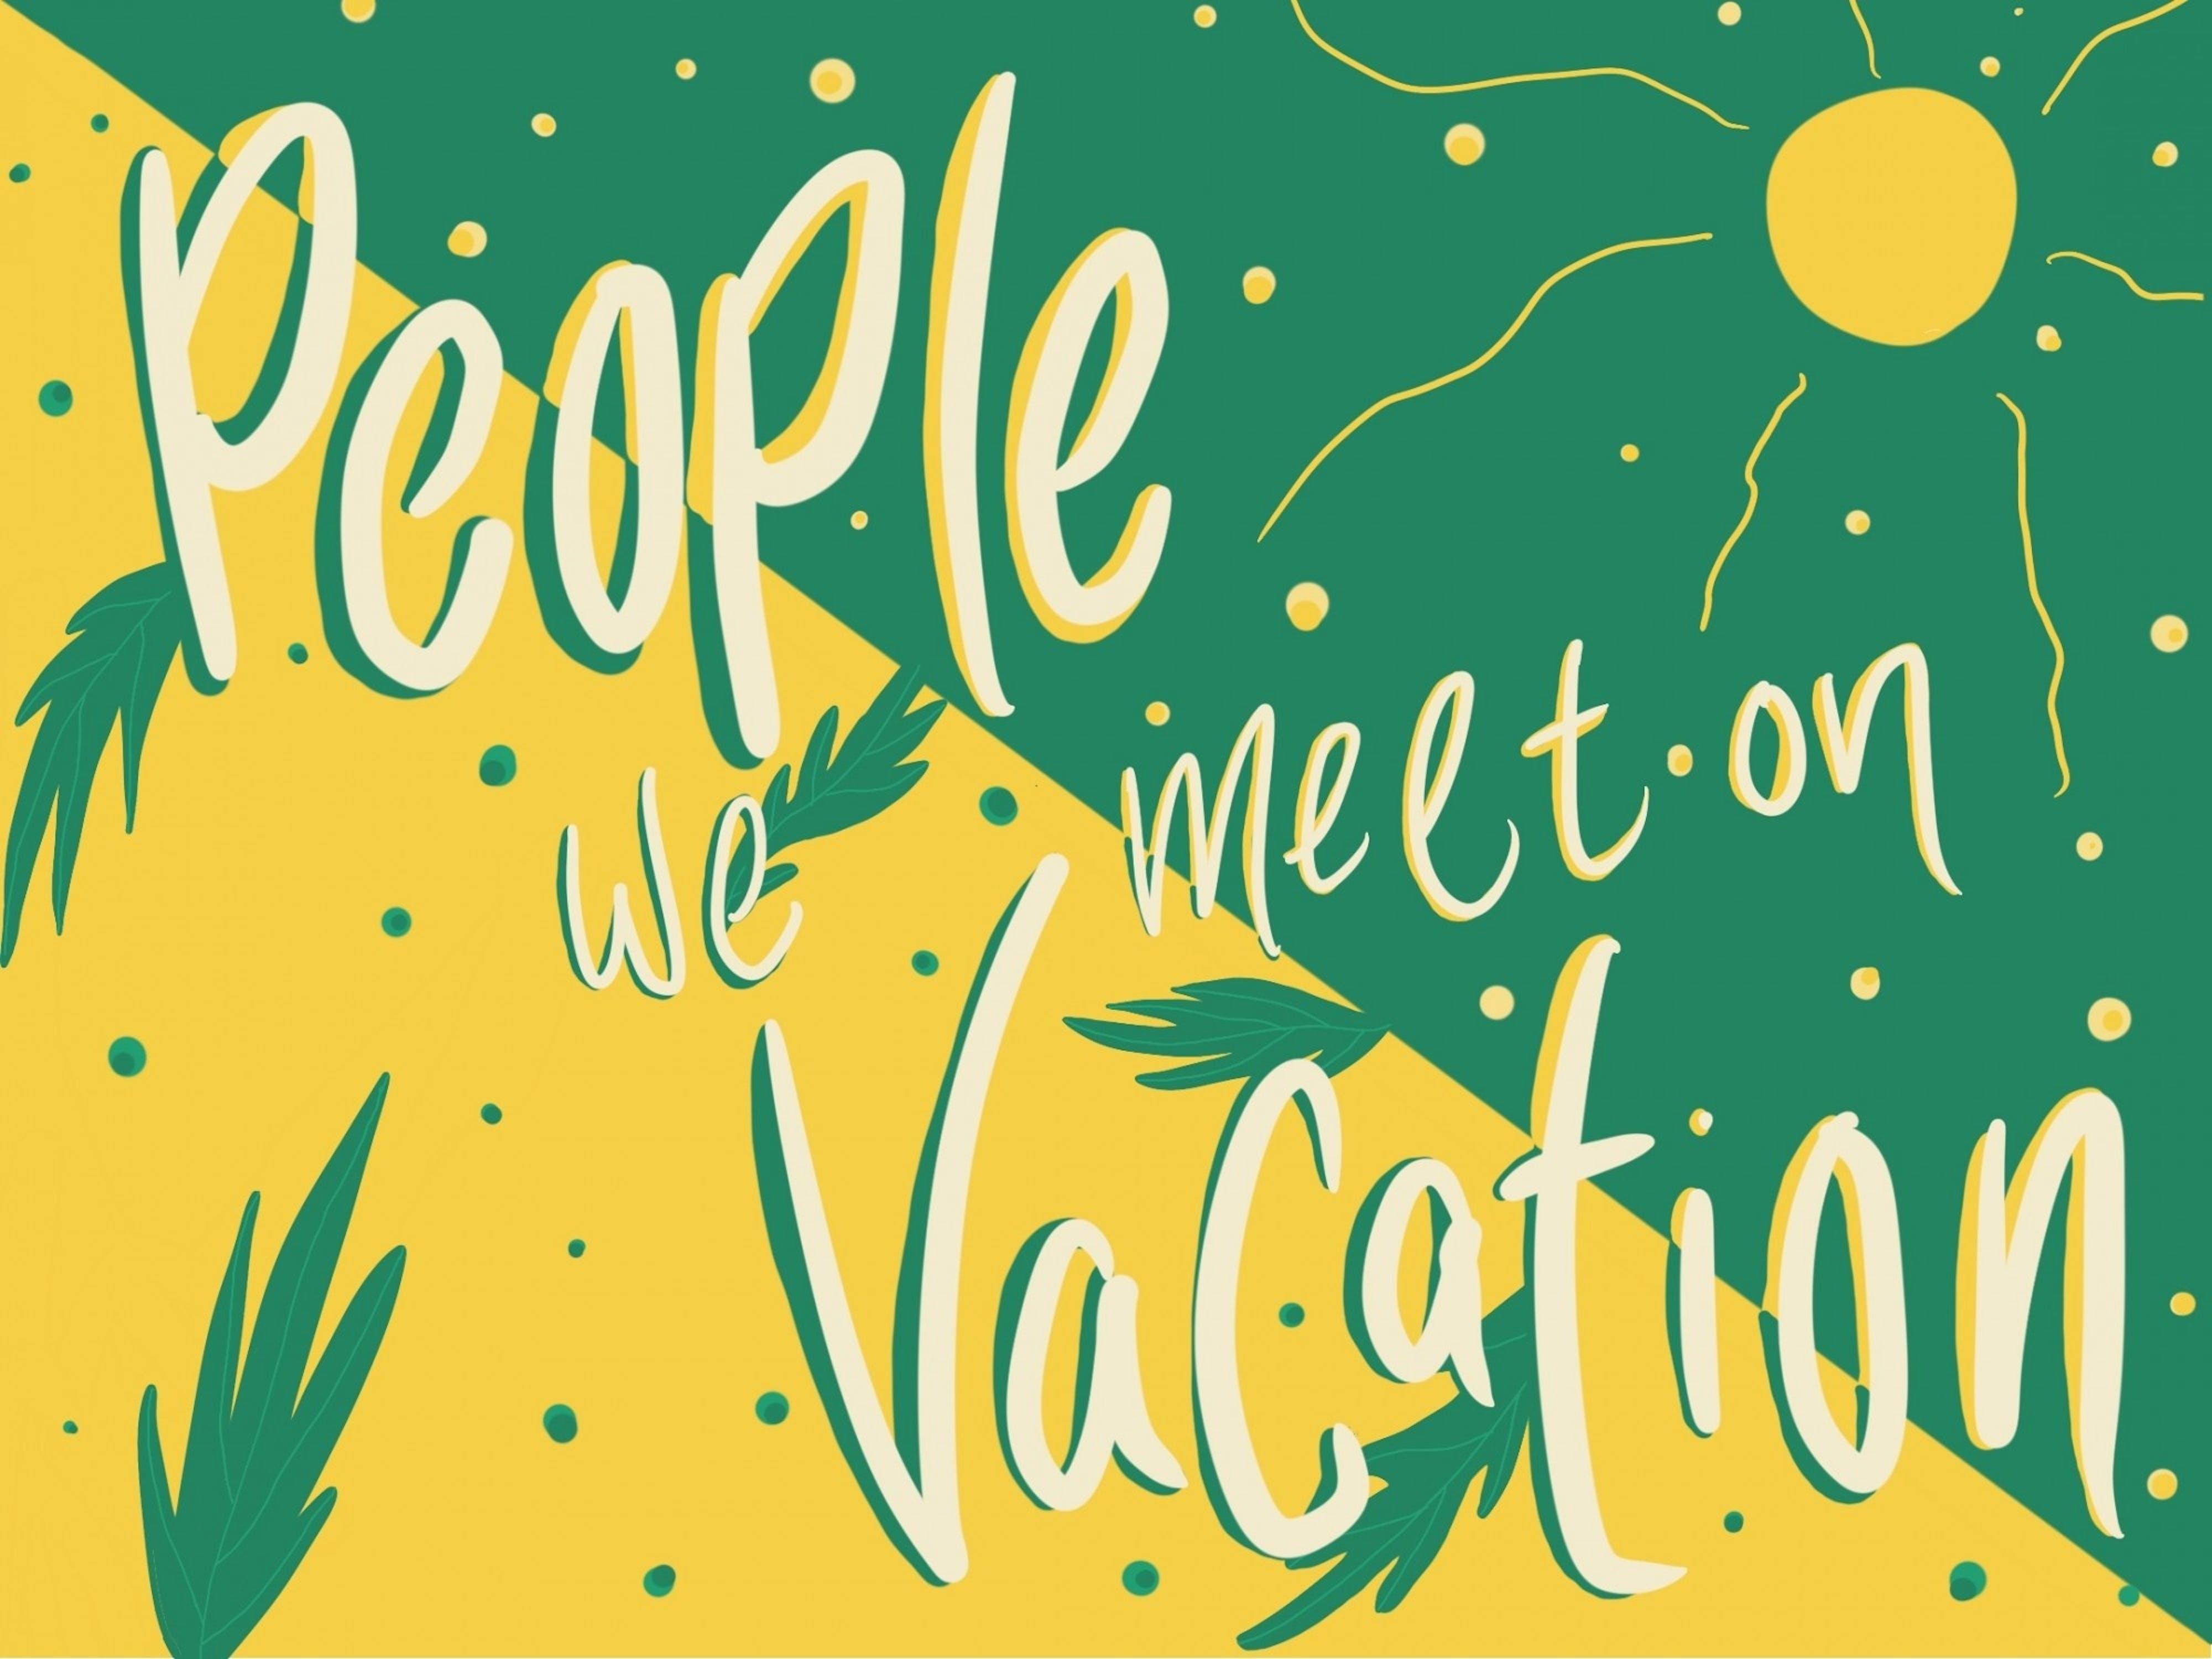 people-we-meet-on-vacation